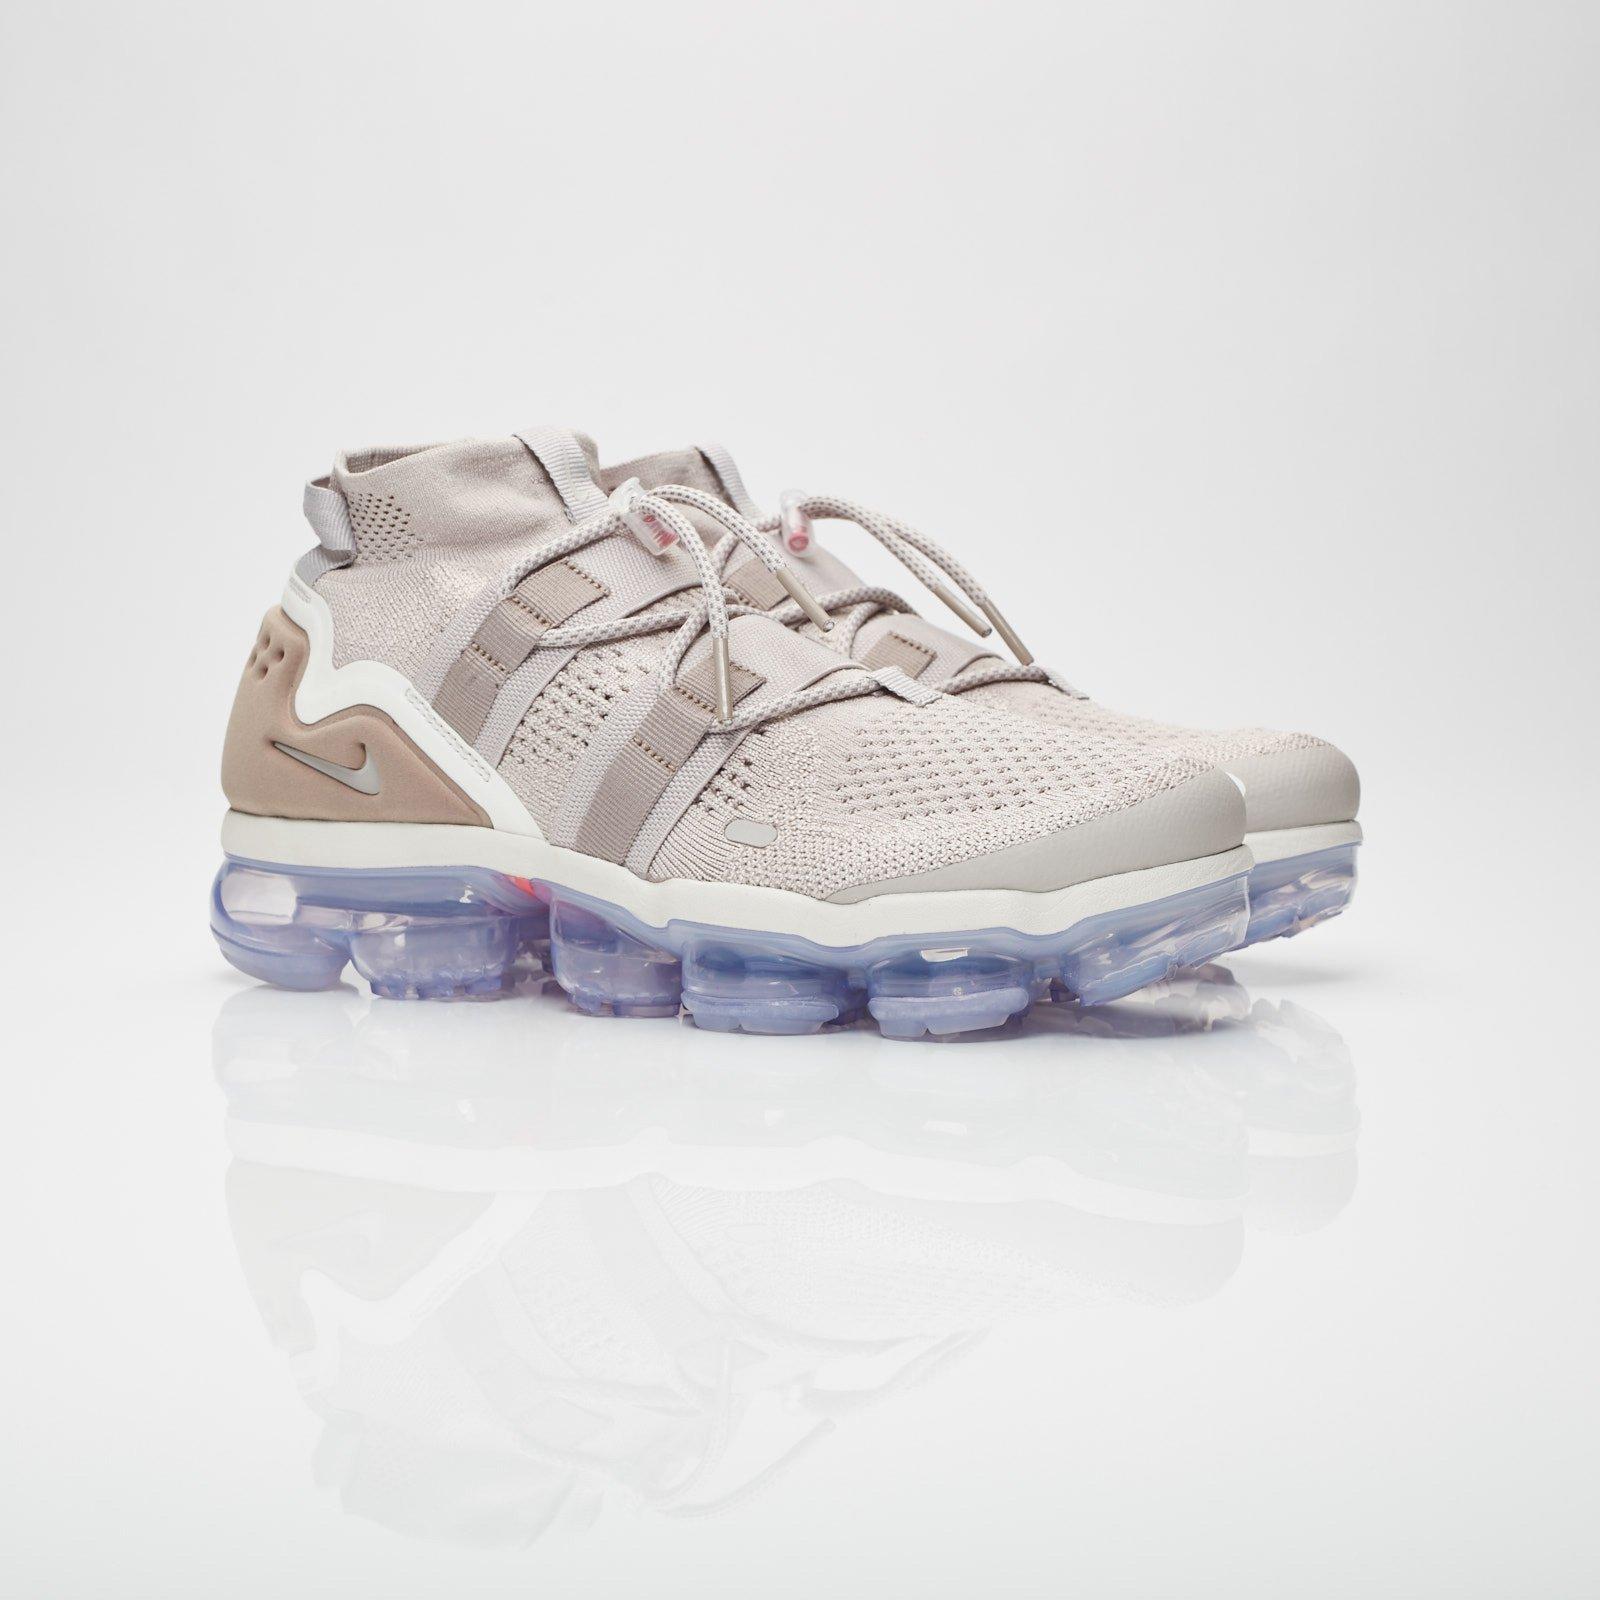 huge discount f5398 43cfa Nike Air Vapormax FK Utility - Ah6834-205 - Sneakersnstuff ...